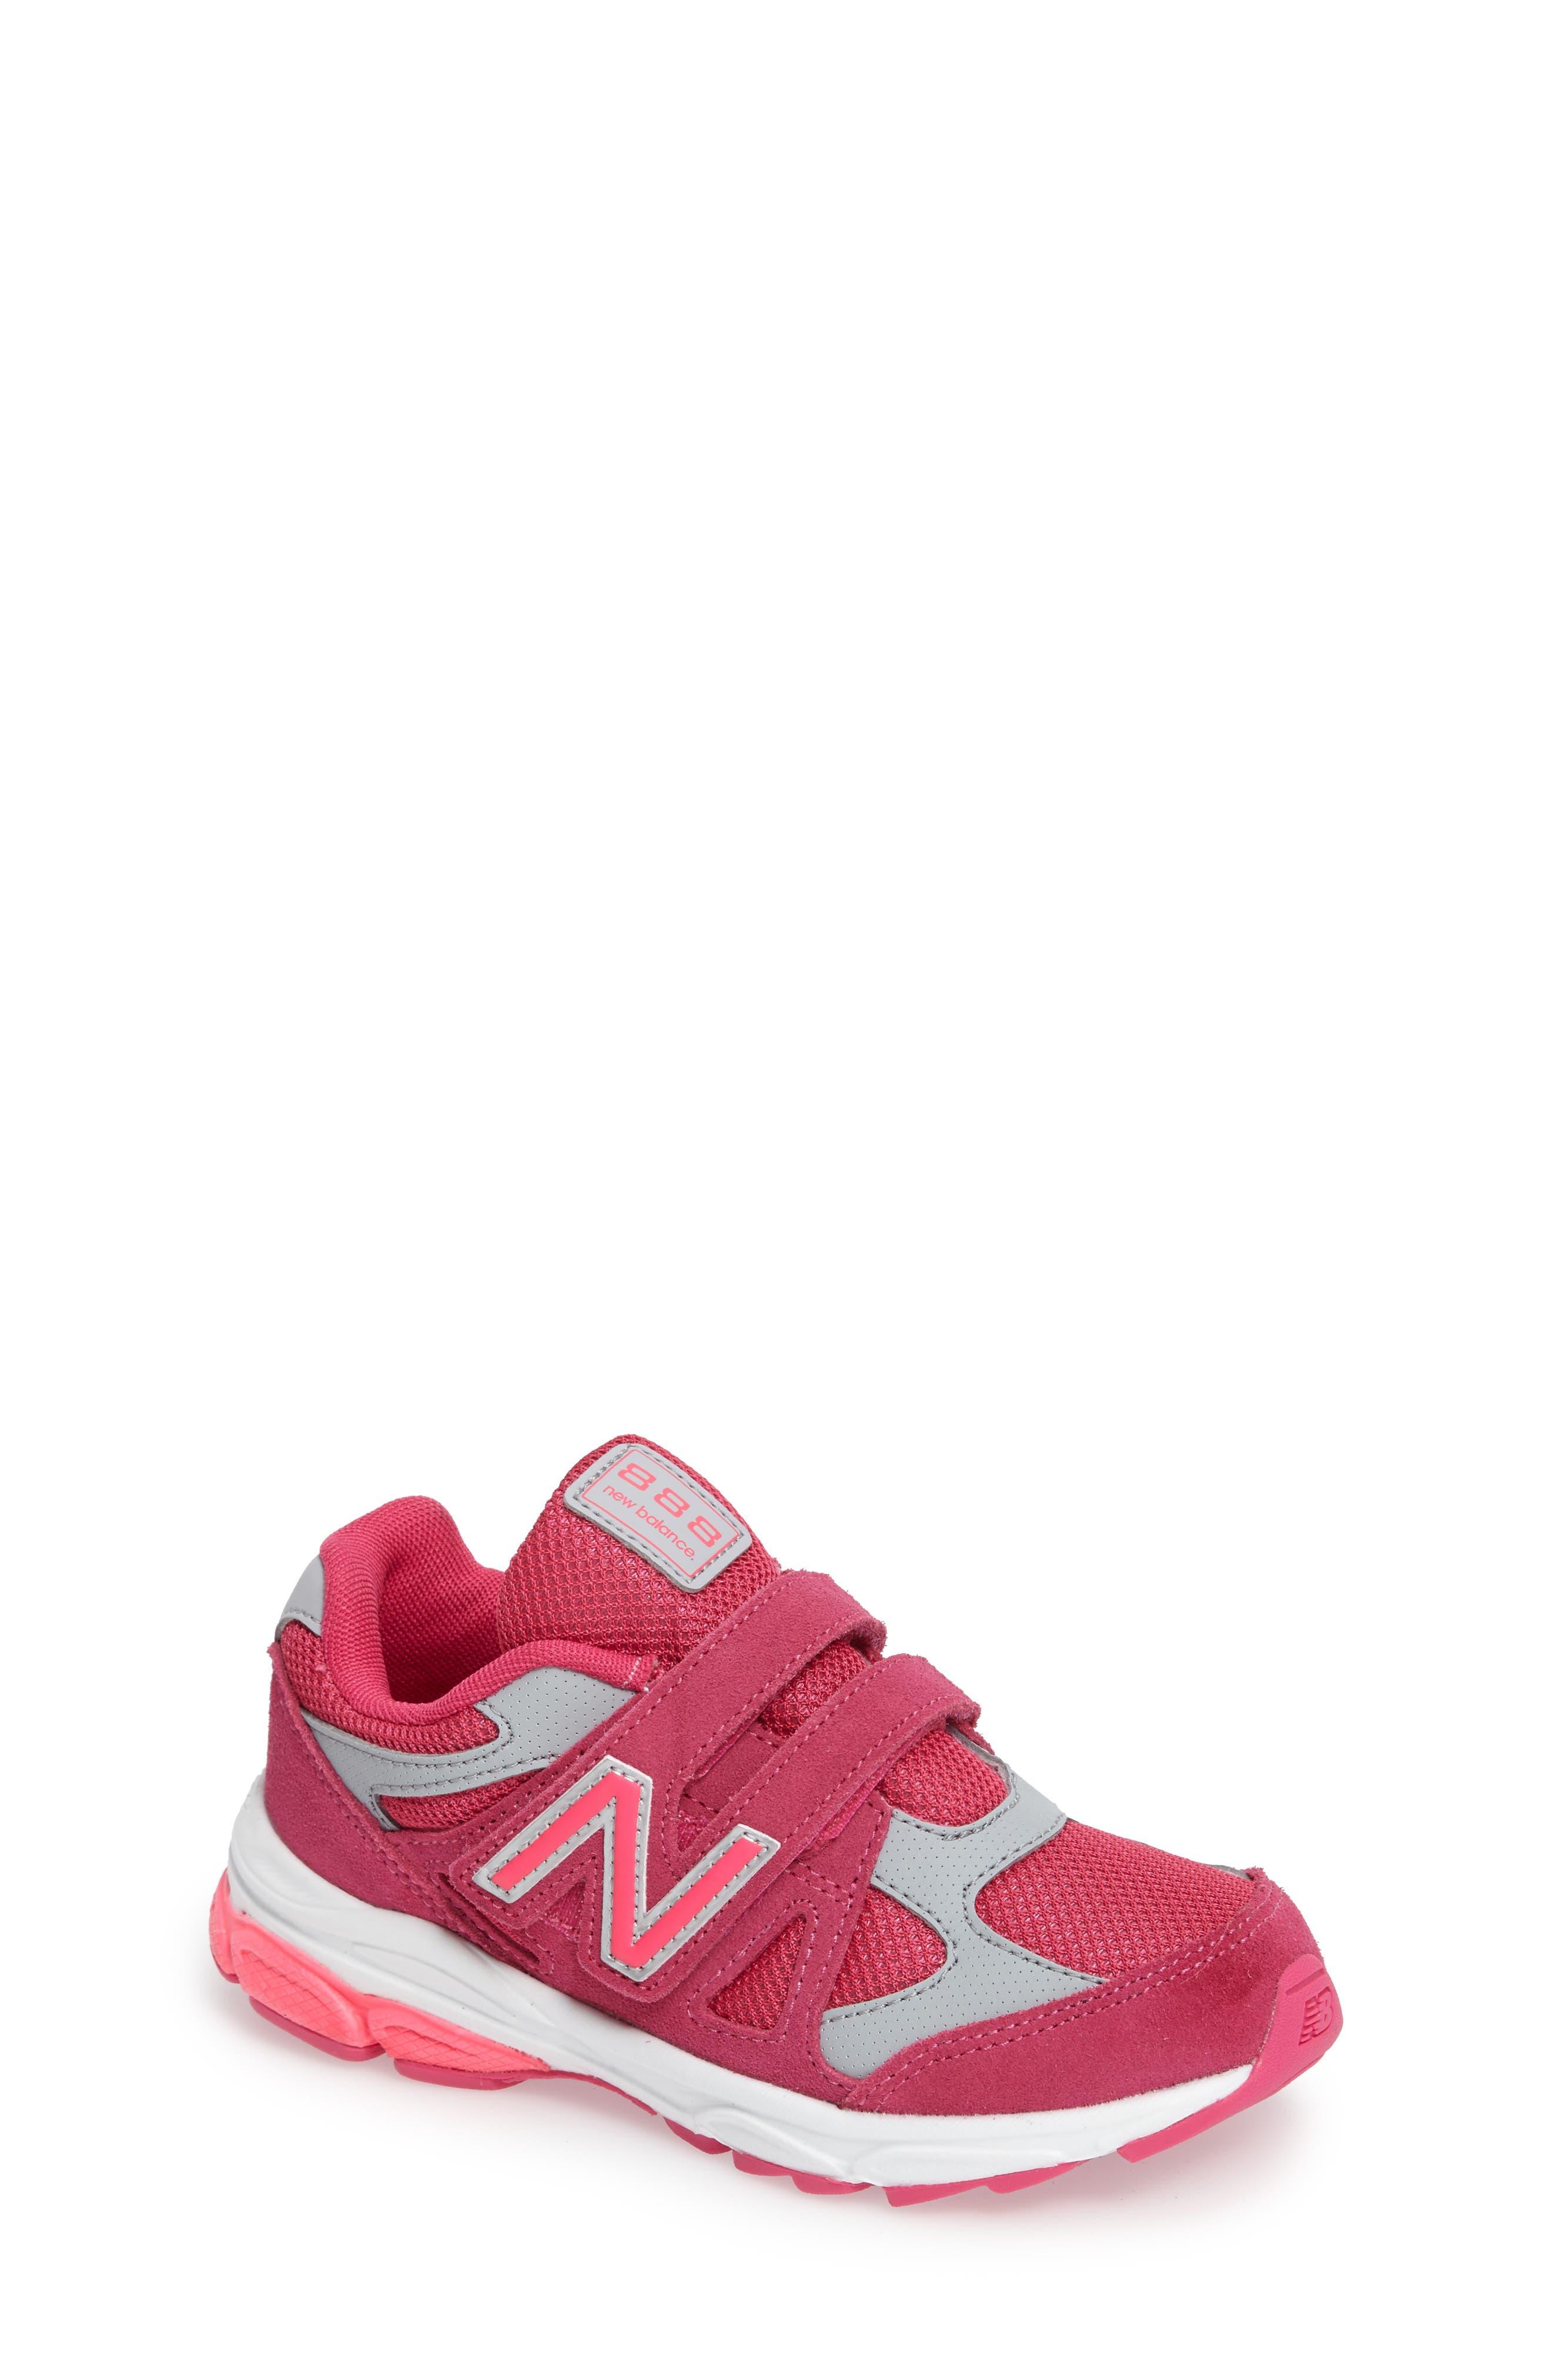 888 Sneaker,                             Main thumbnail 1, color,                             Pink/Grey